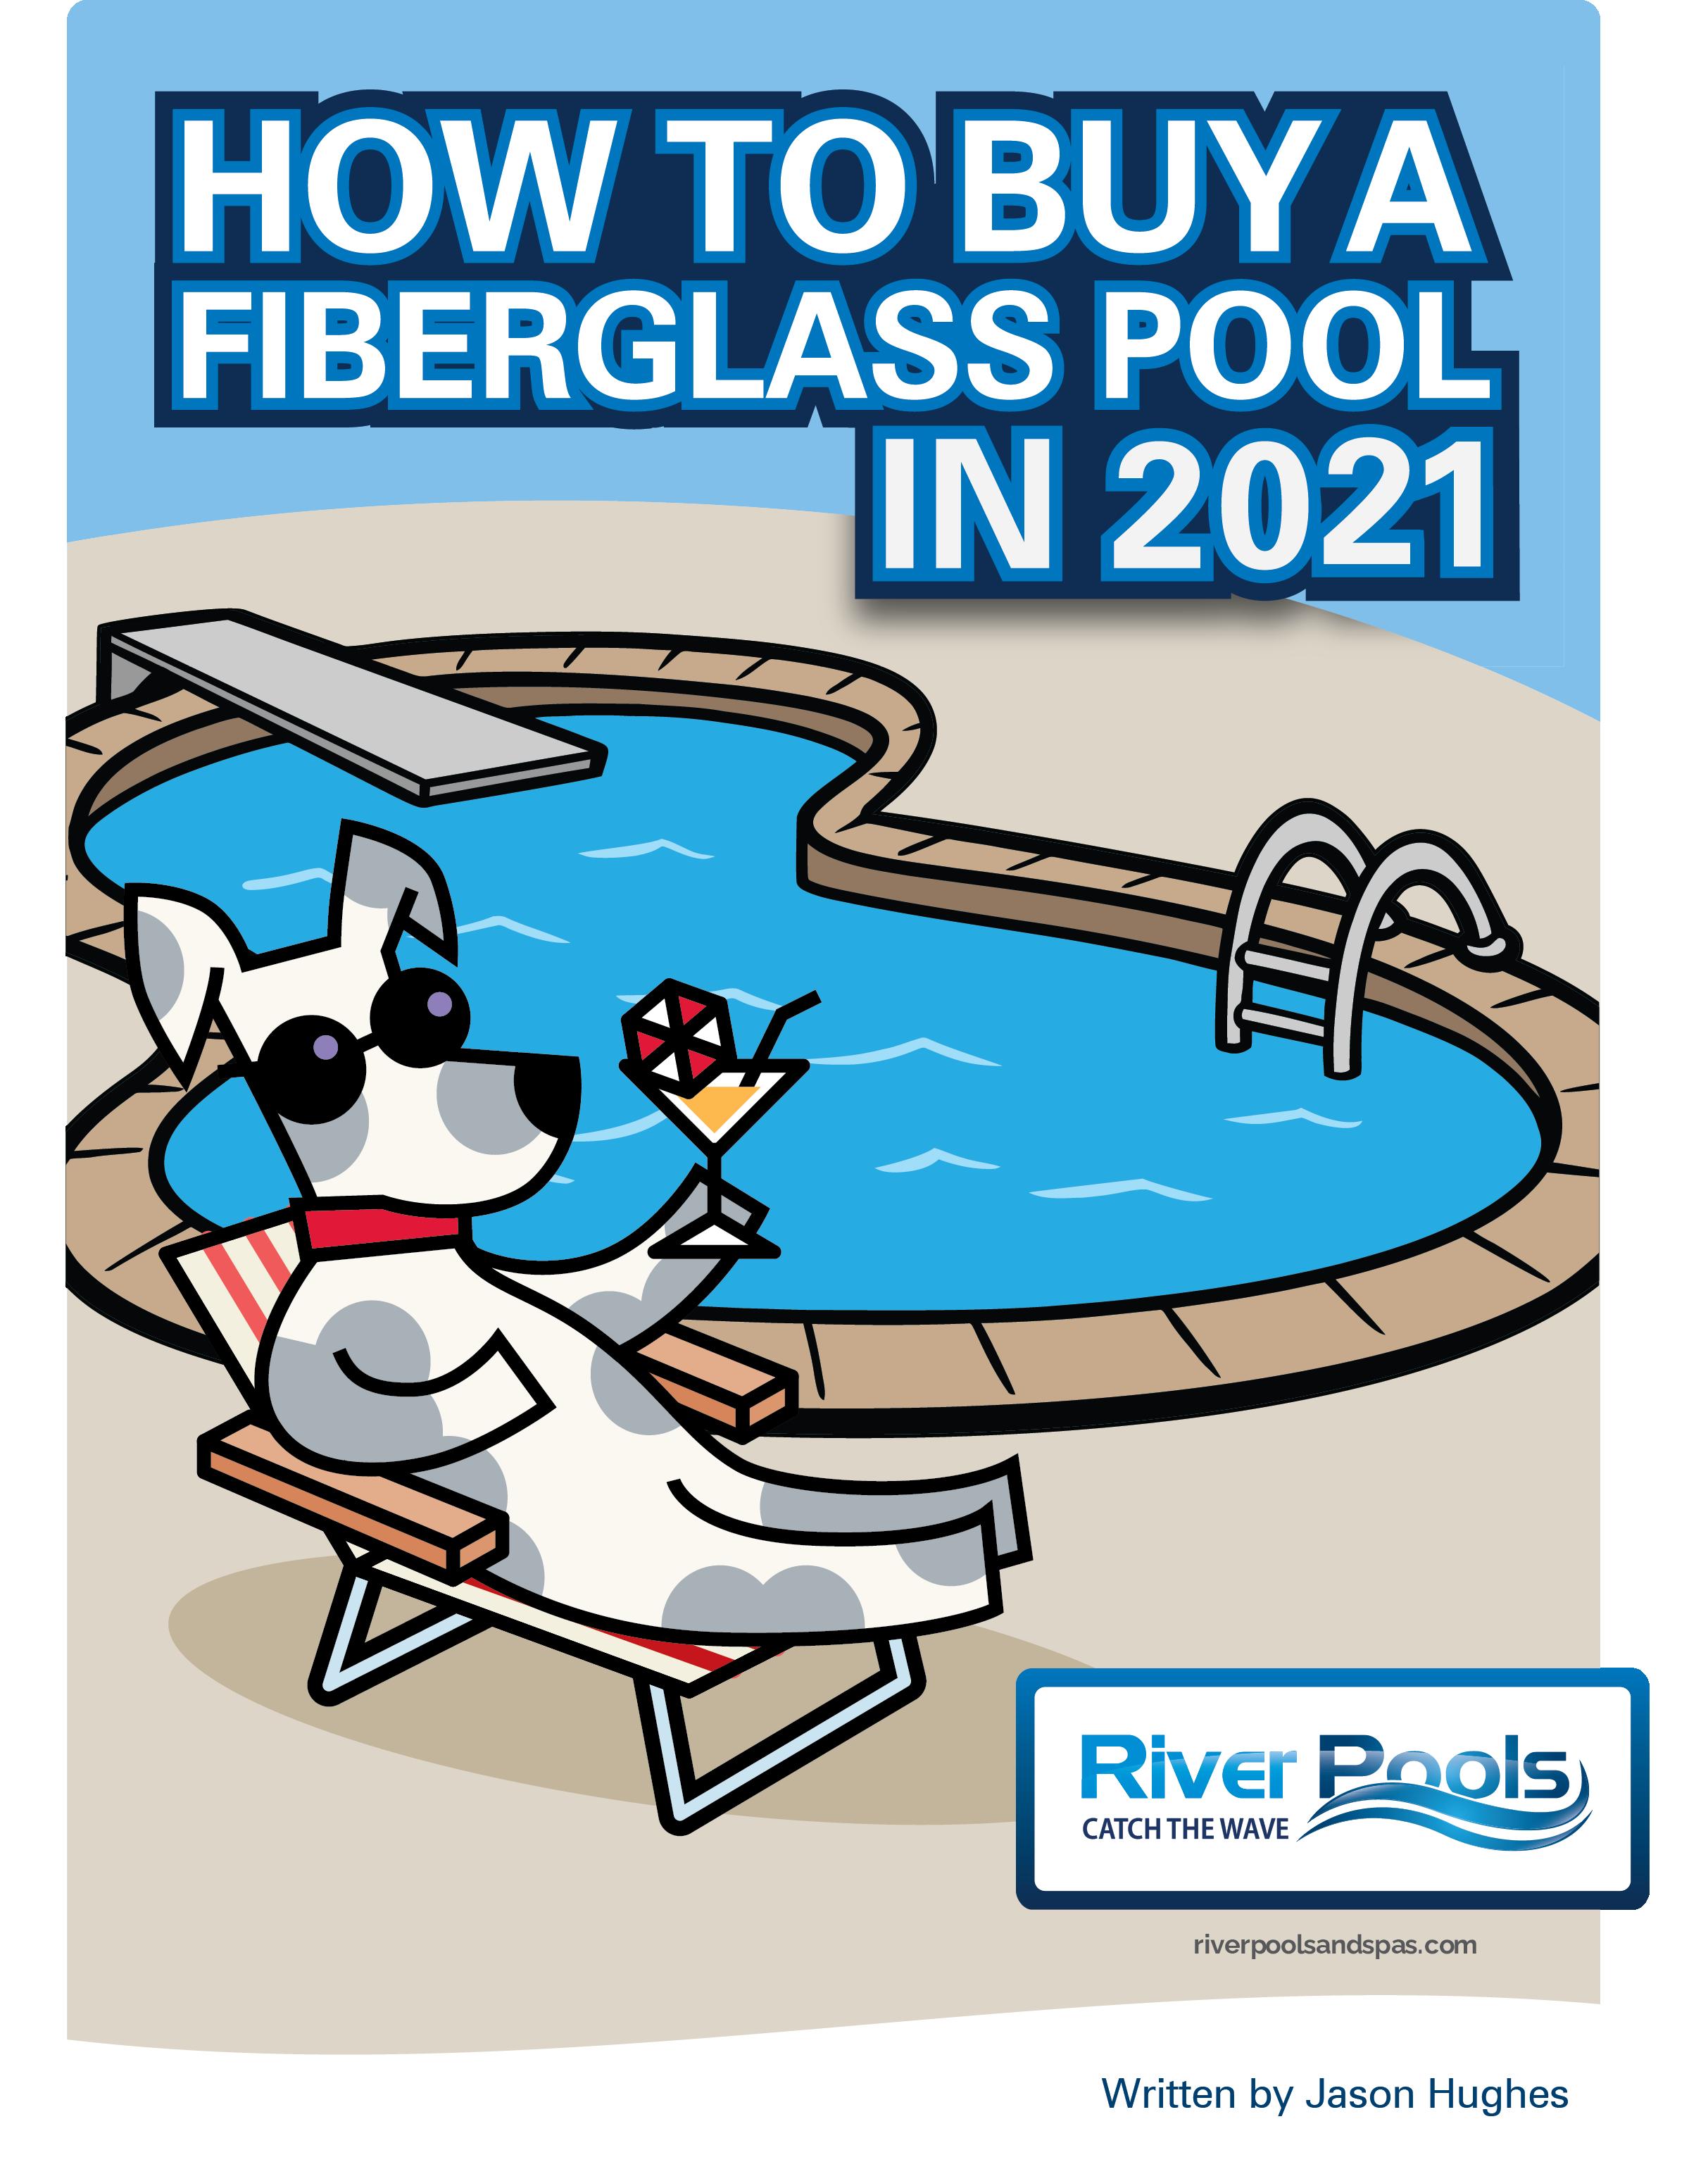 ebook-2021-how-to-buy-fiberglass-pool